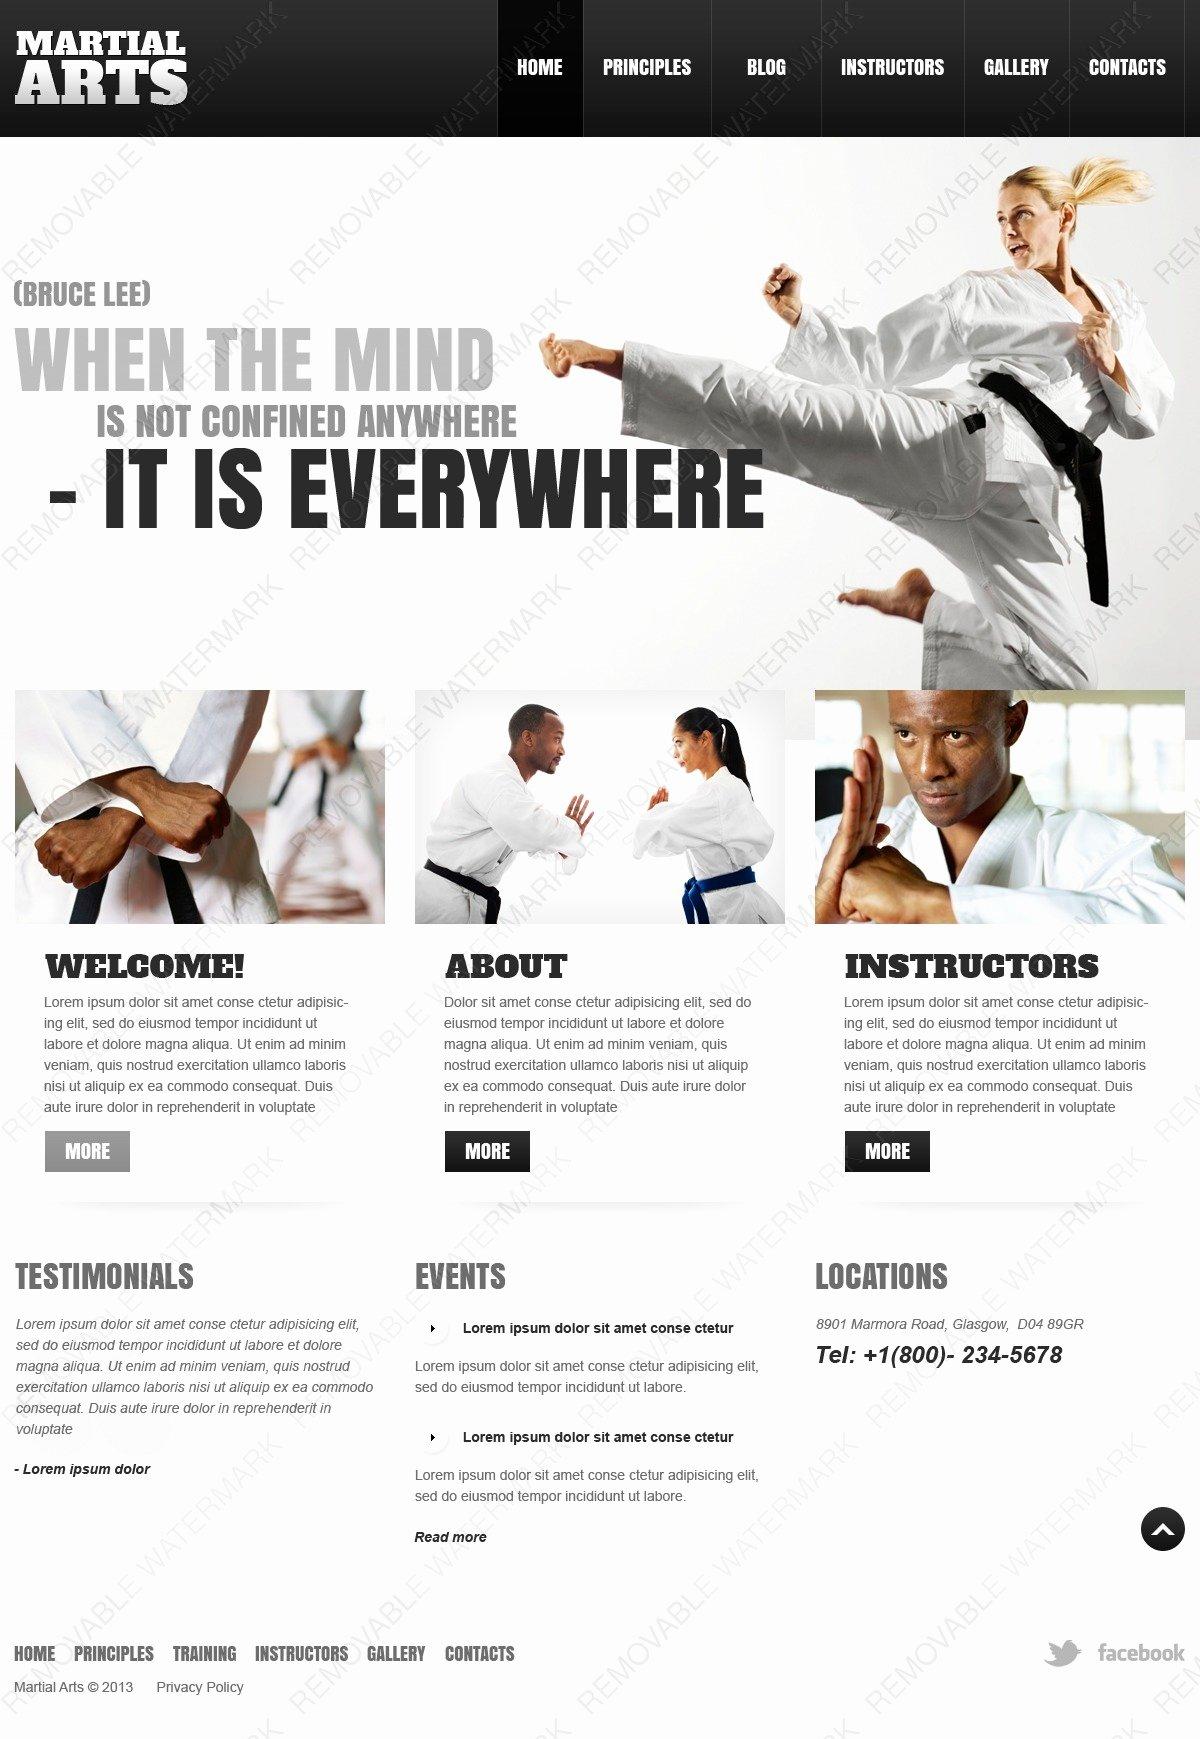 Martial Arts Wordpress theme Beautiful Martial Arts Wordpress theme by Wt Wordpress themes